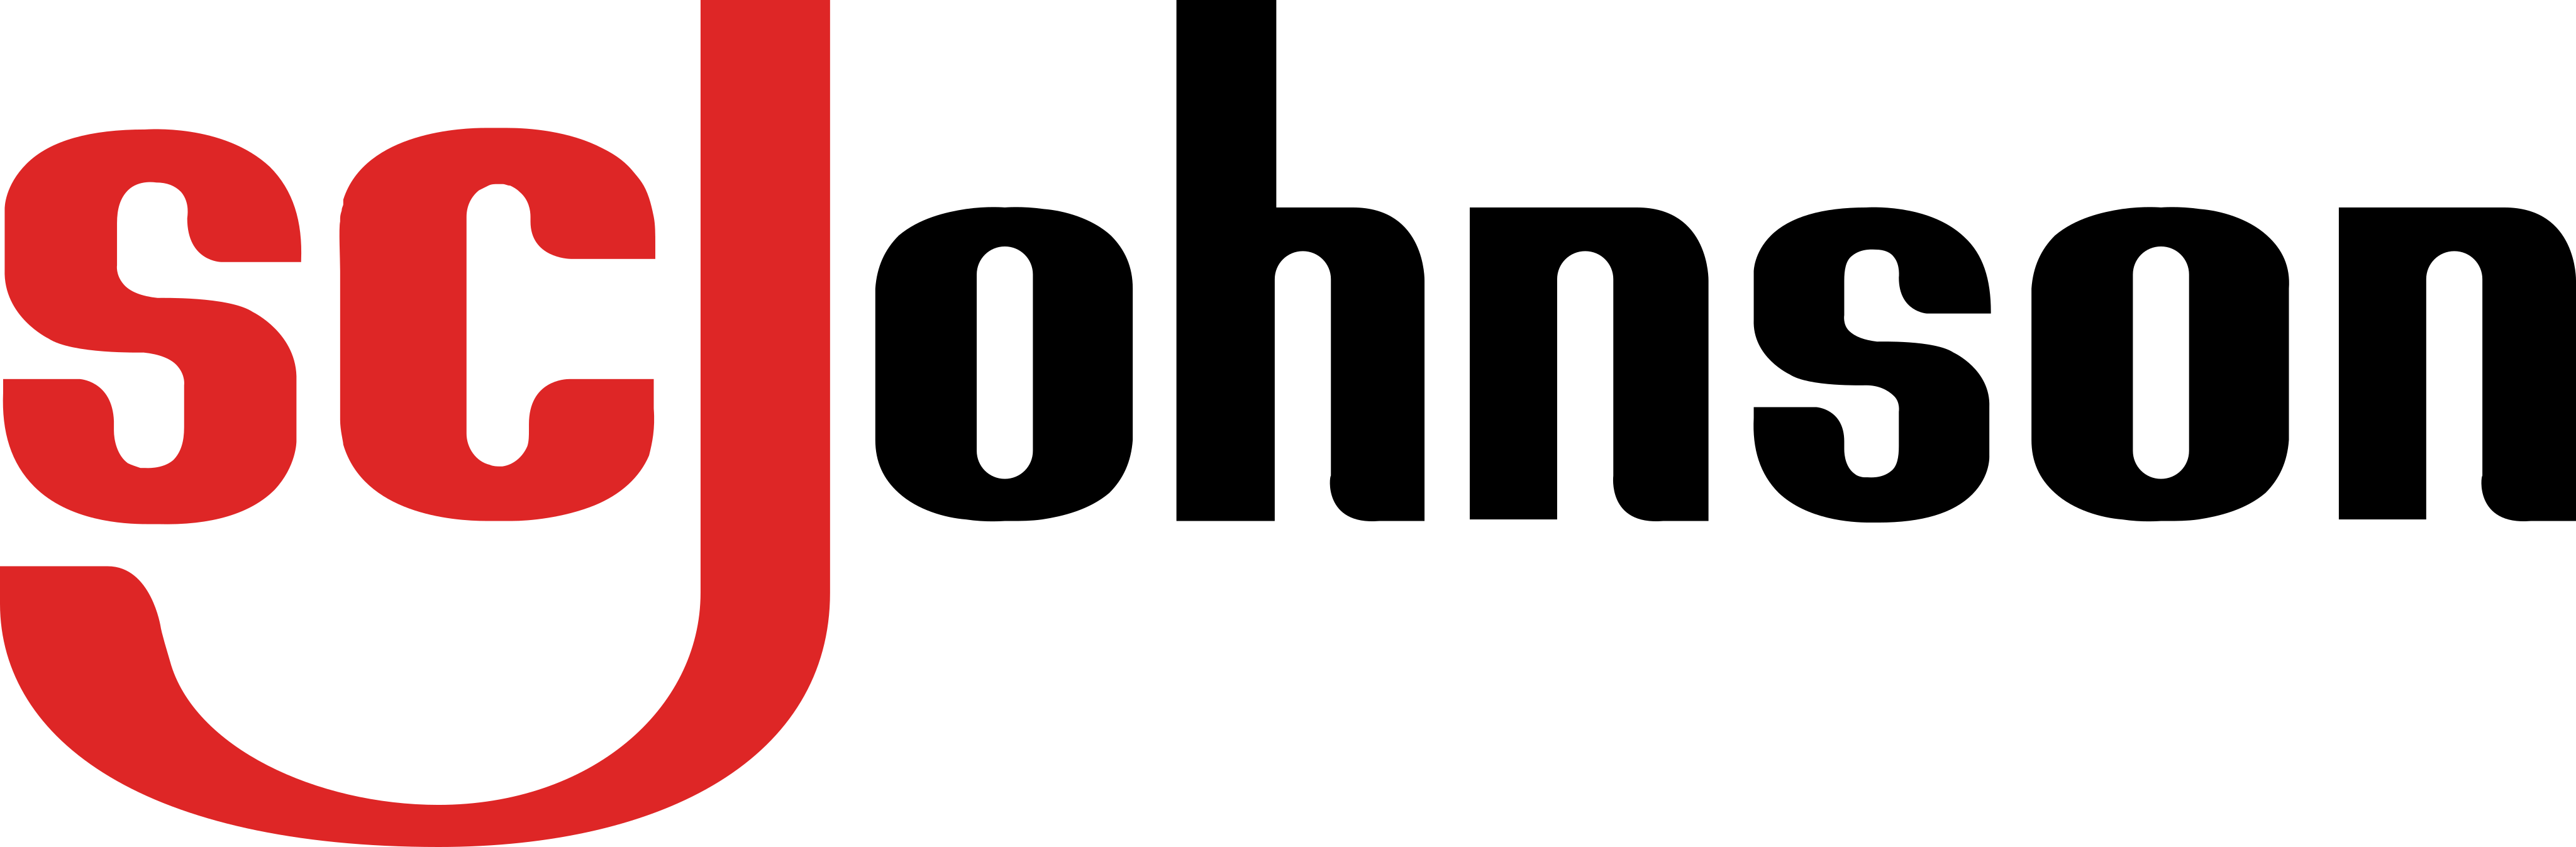 sc johnson logo - SC Johnson Logo